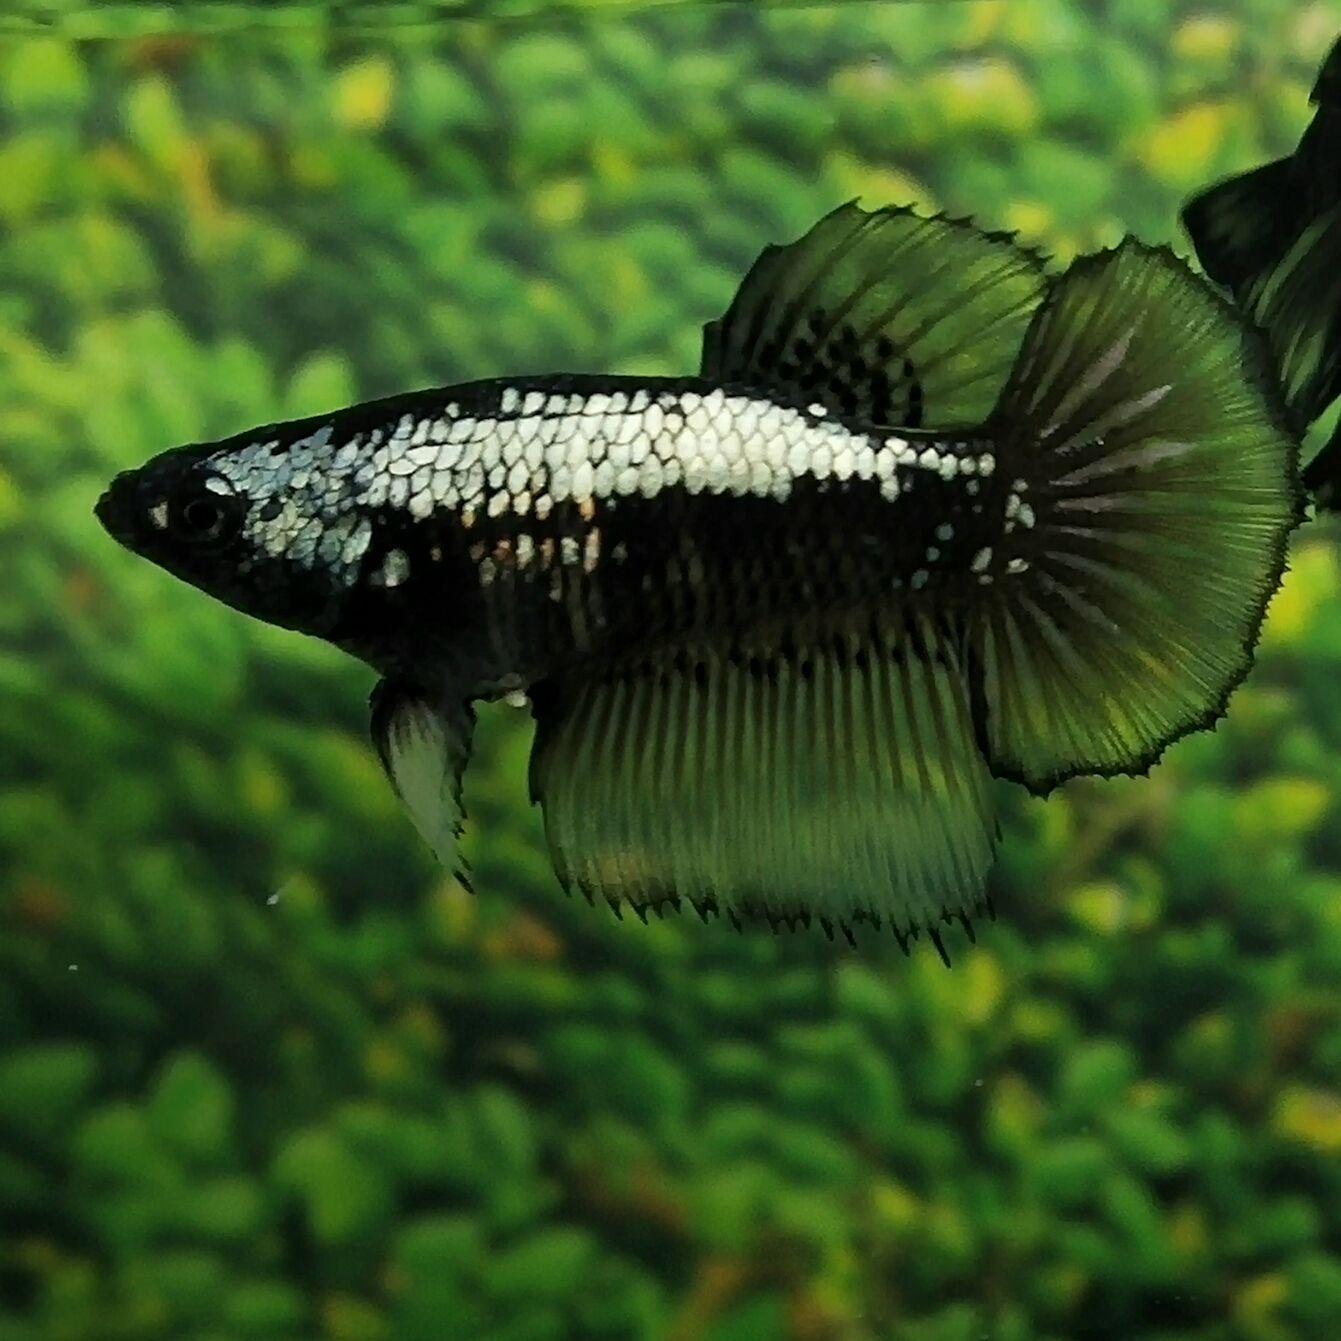 Aquabid Com Item Fwbettashm1584608551 Copper Black Gass Samurai Hm Female M16 Ends Thu Mar 19 2020 04 02 31 Am Cdt Halfmoon Betta Betta Betta Fish